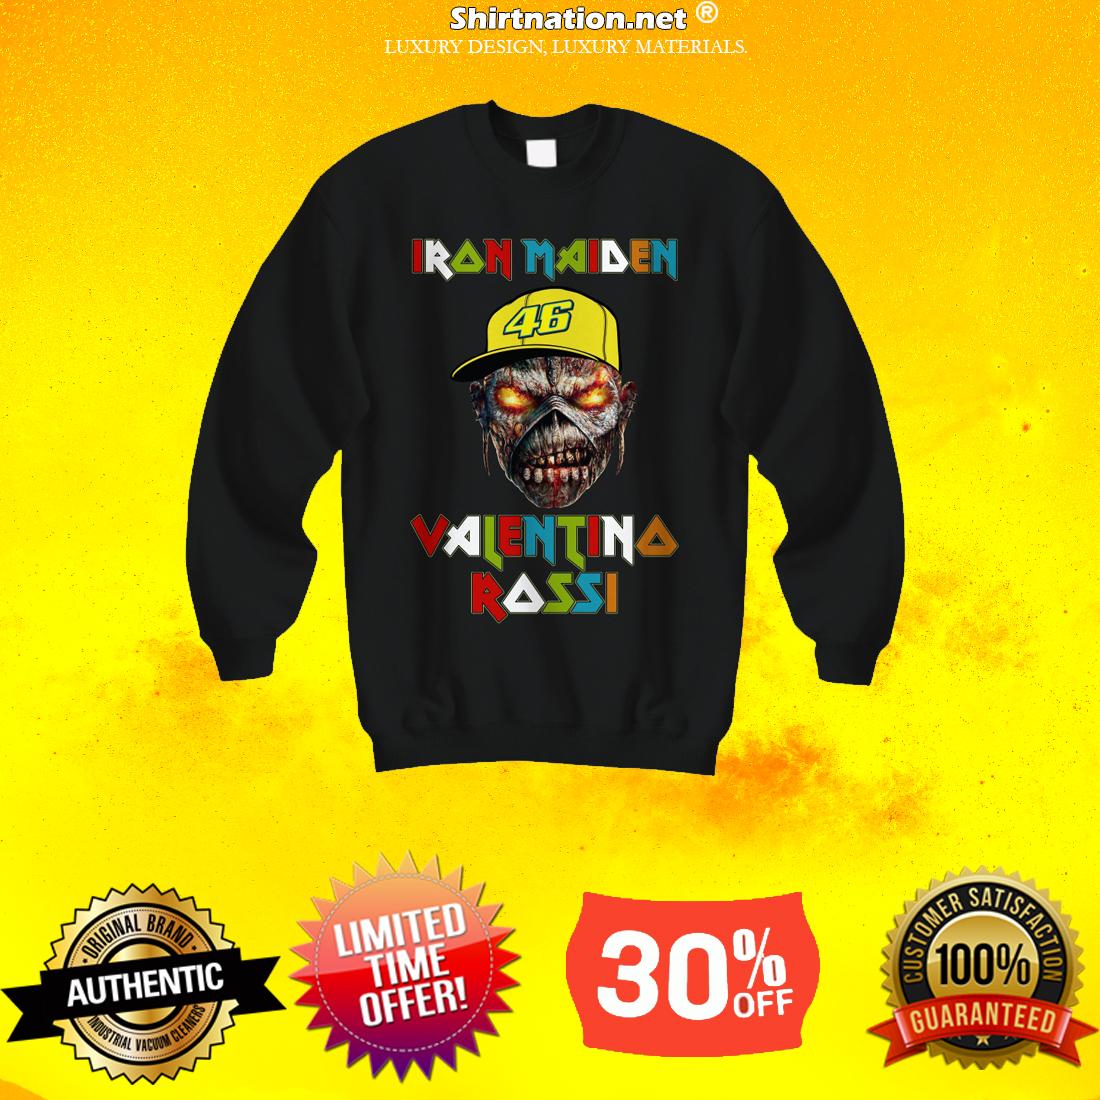 Iron Maiden Valentino Rossi sweatshirt